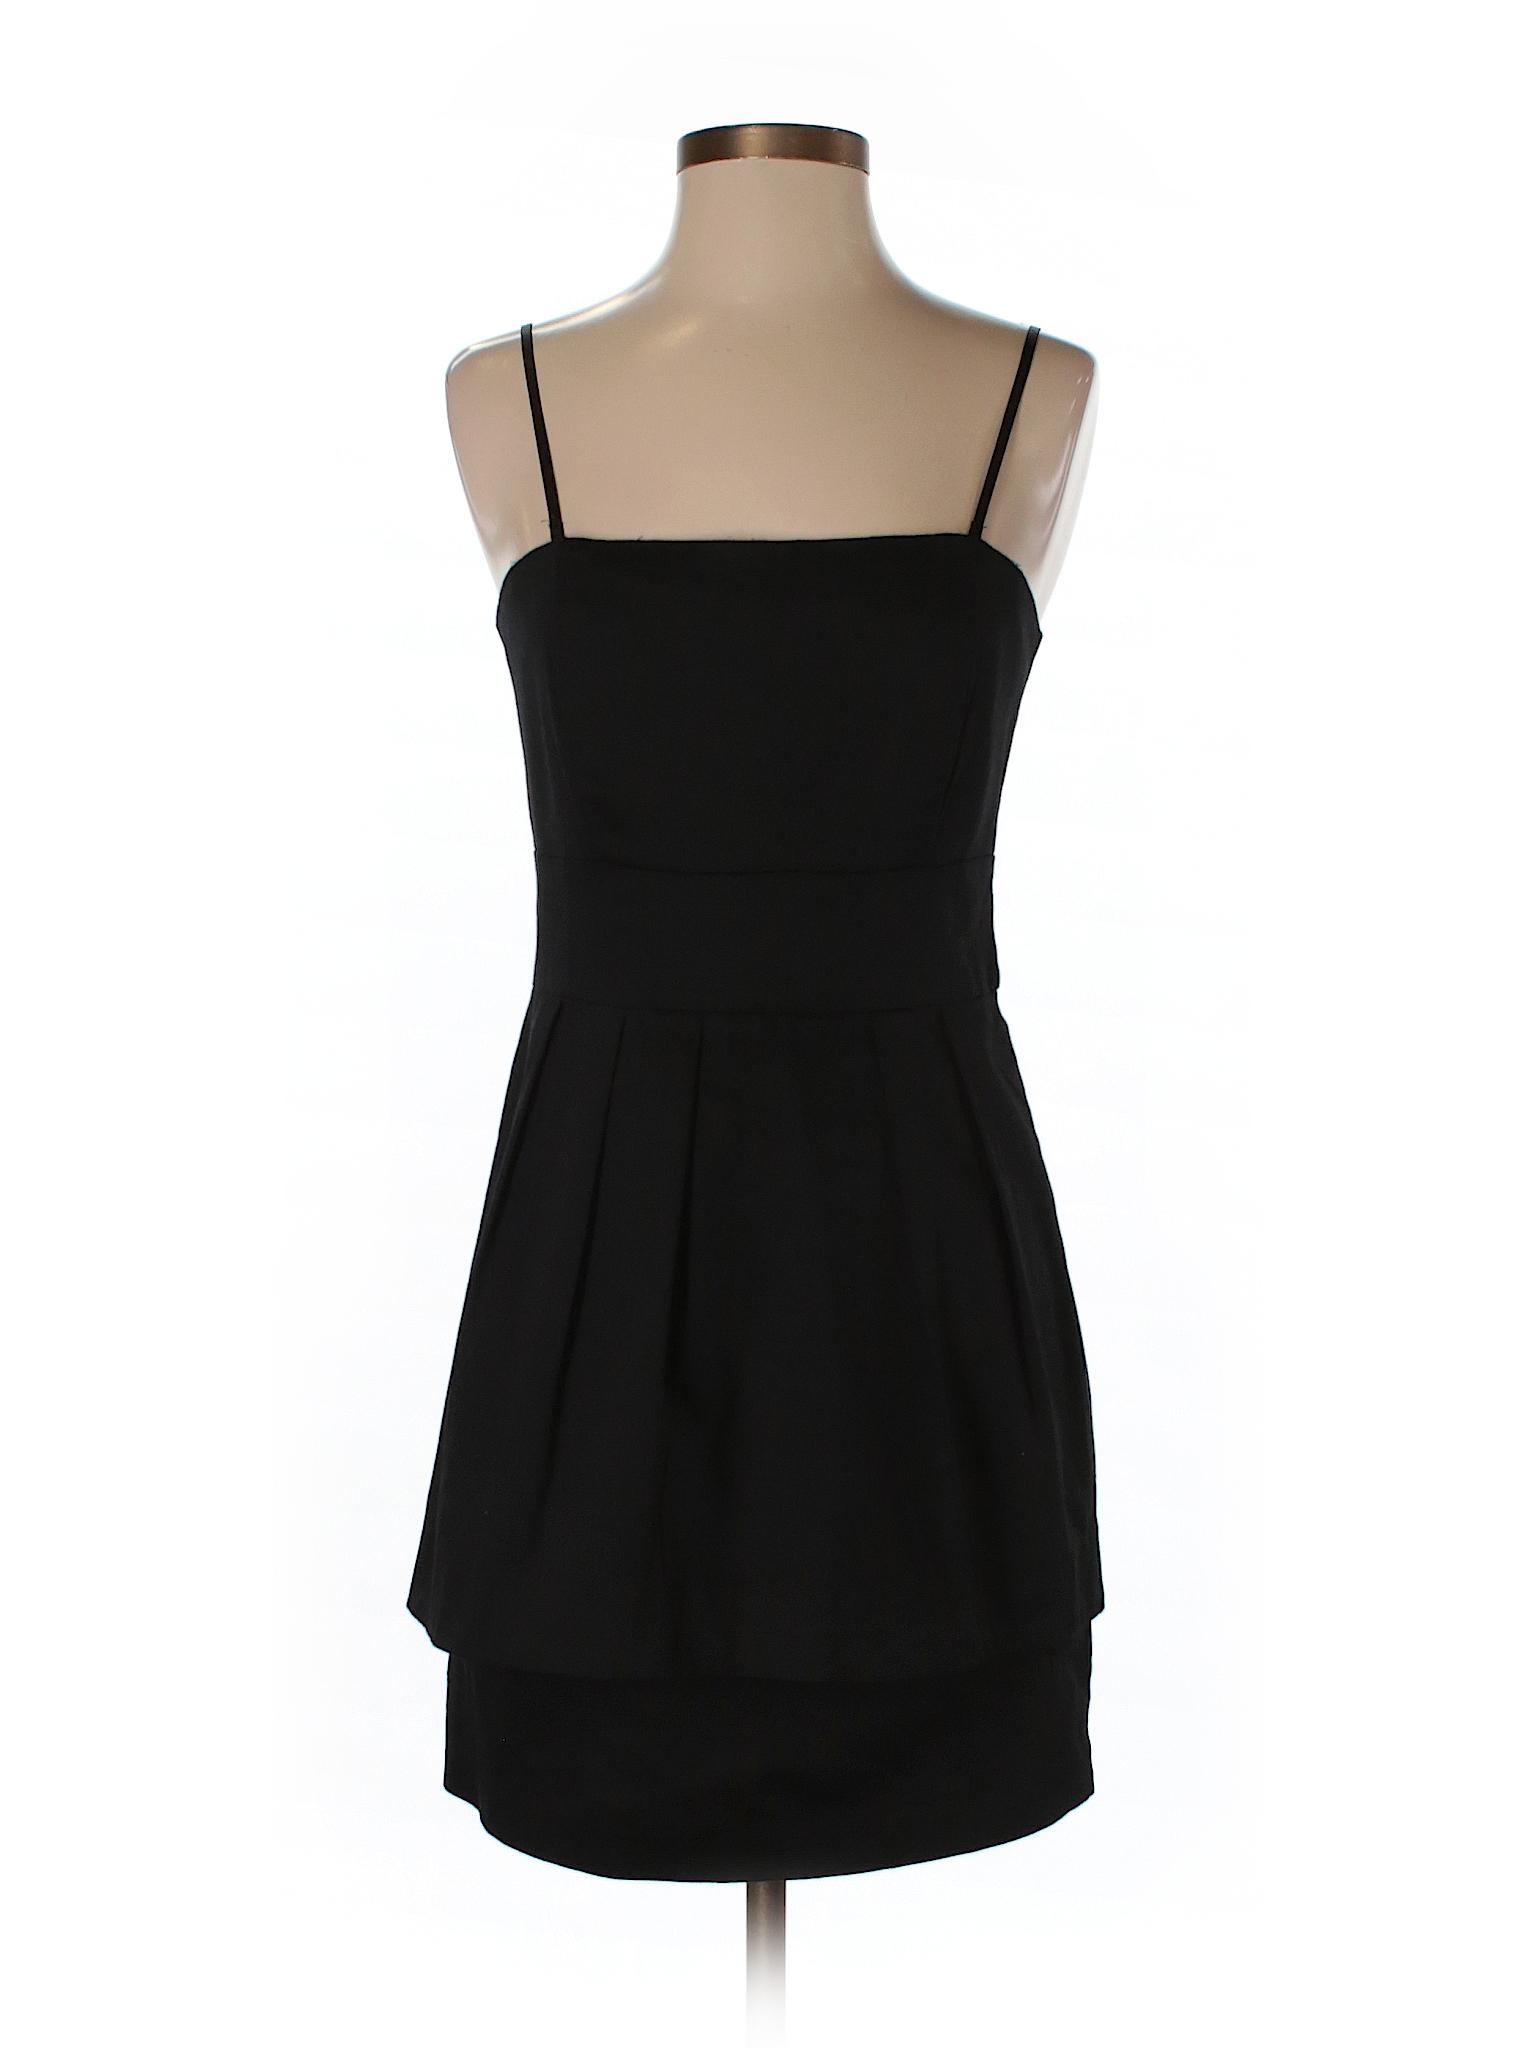 Casual Guess Boutique Boutique winter Dress winter SW6OPFaOn